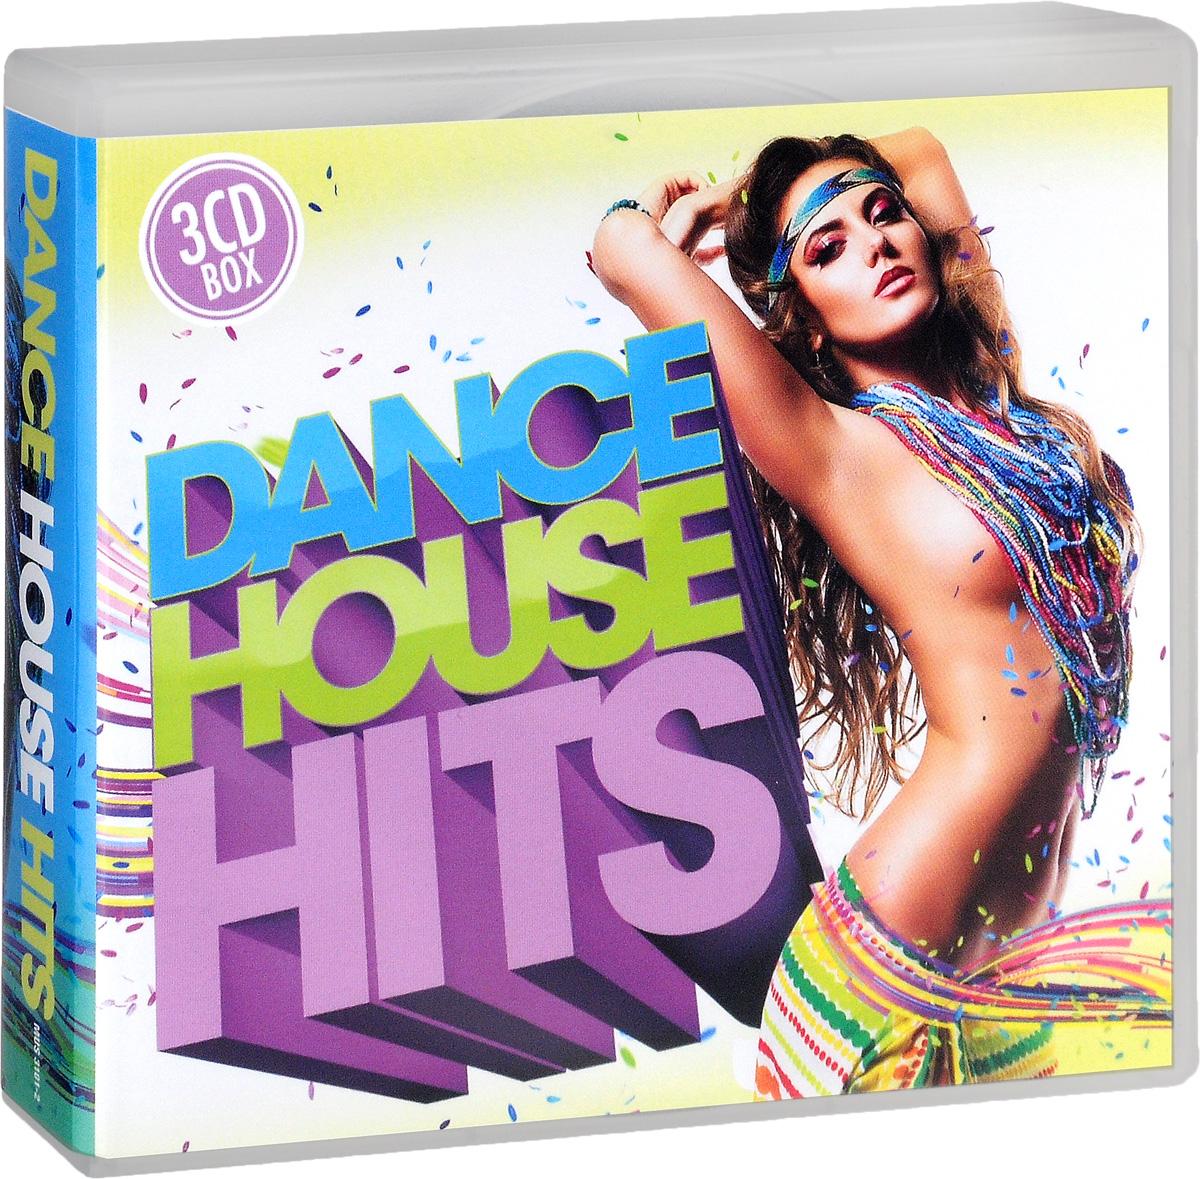 Axwell,Дэвид Гордон,Richelle Dance House Hits (3 CD)